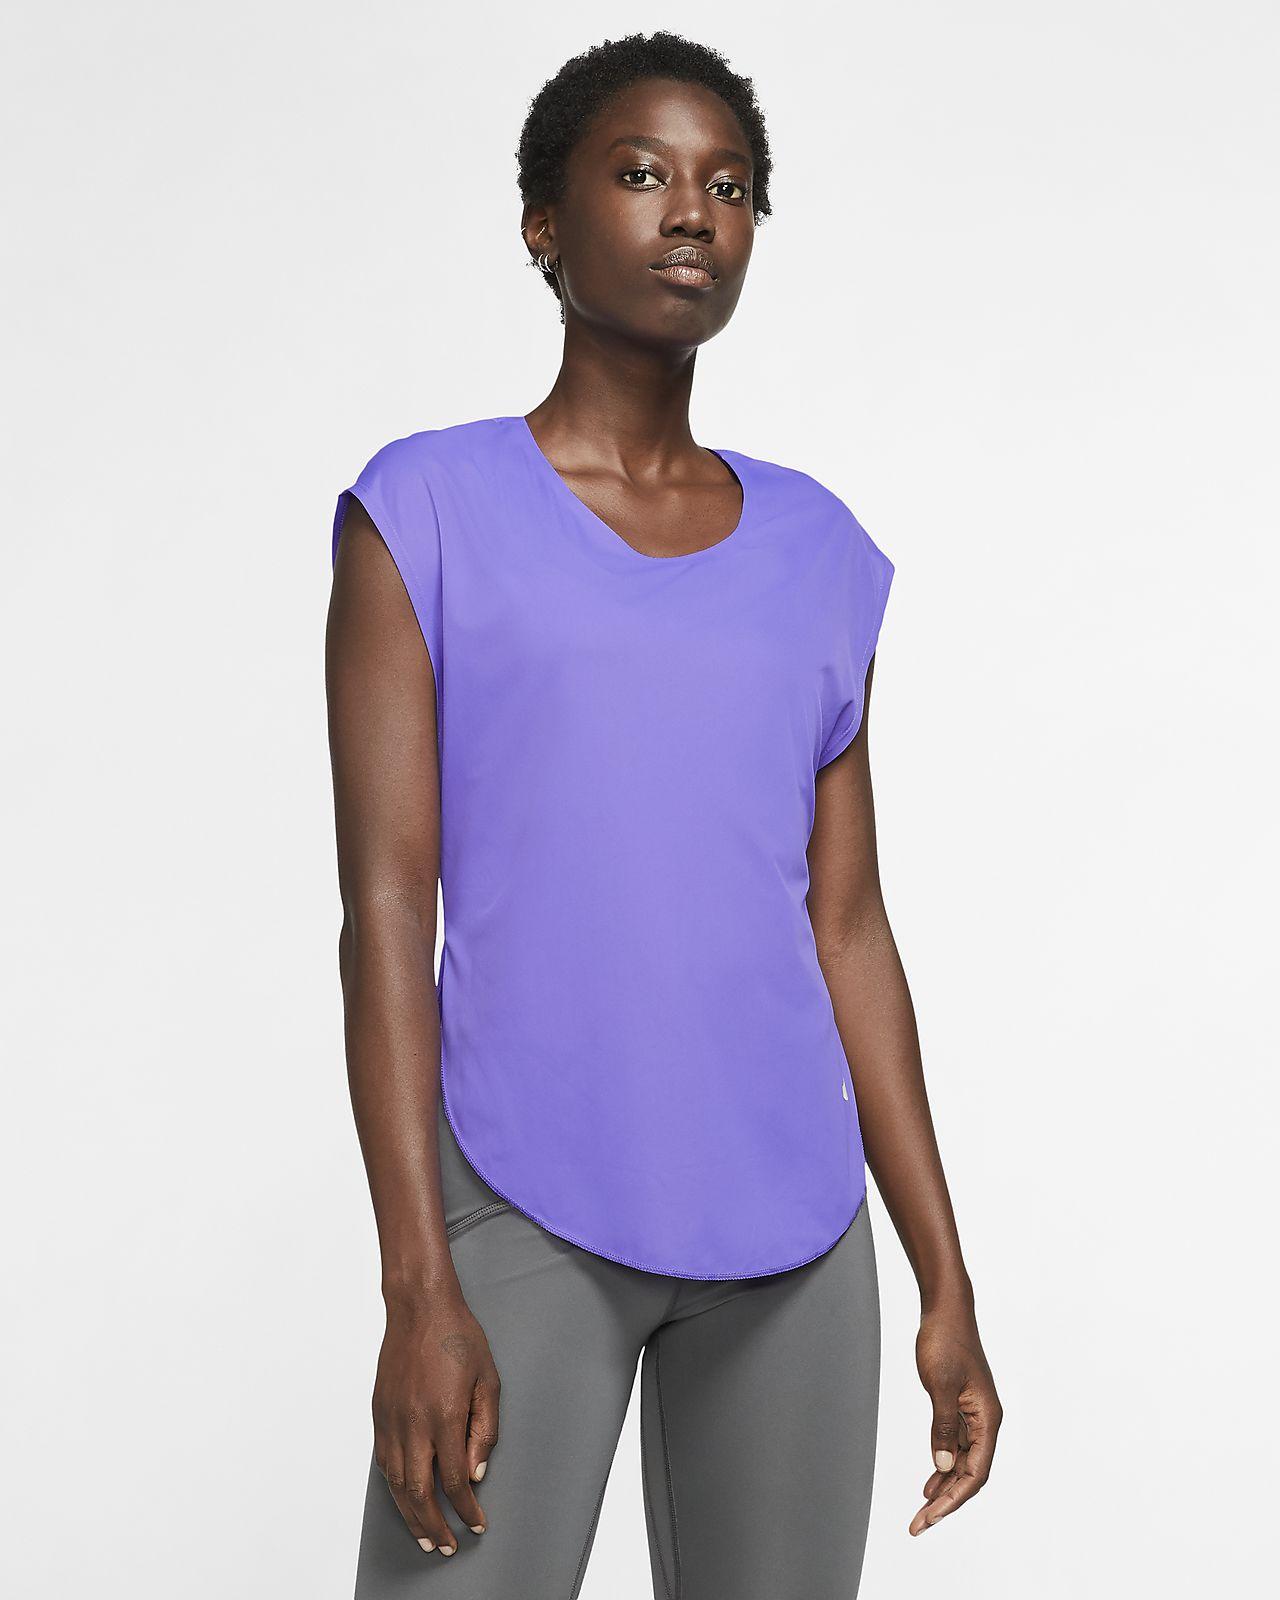 Nike City Sleek Women's Running Top